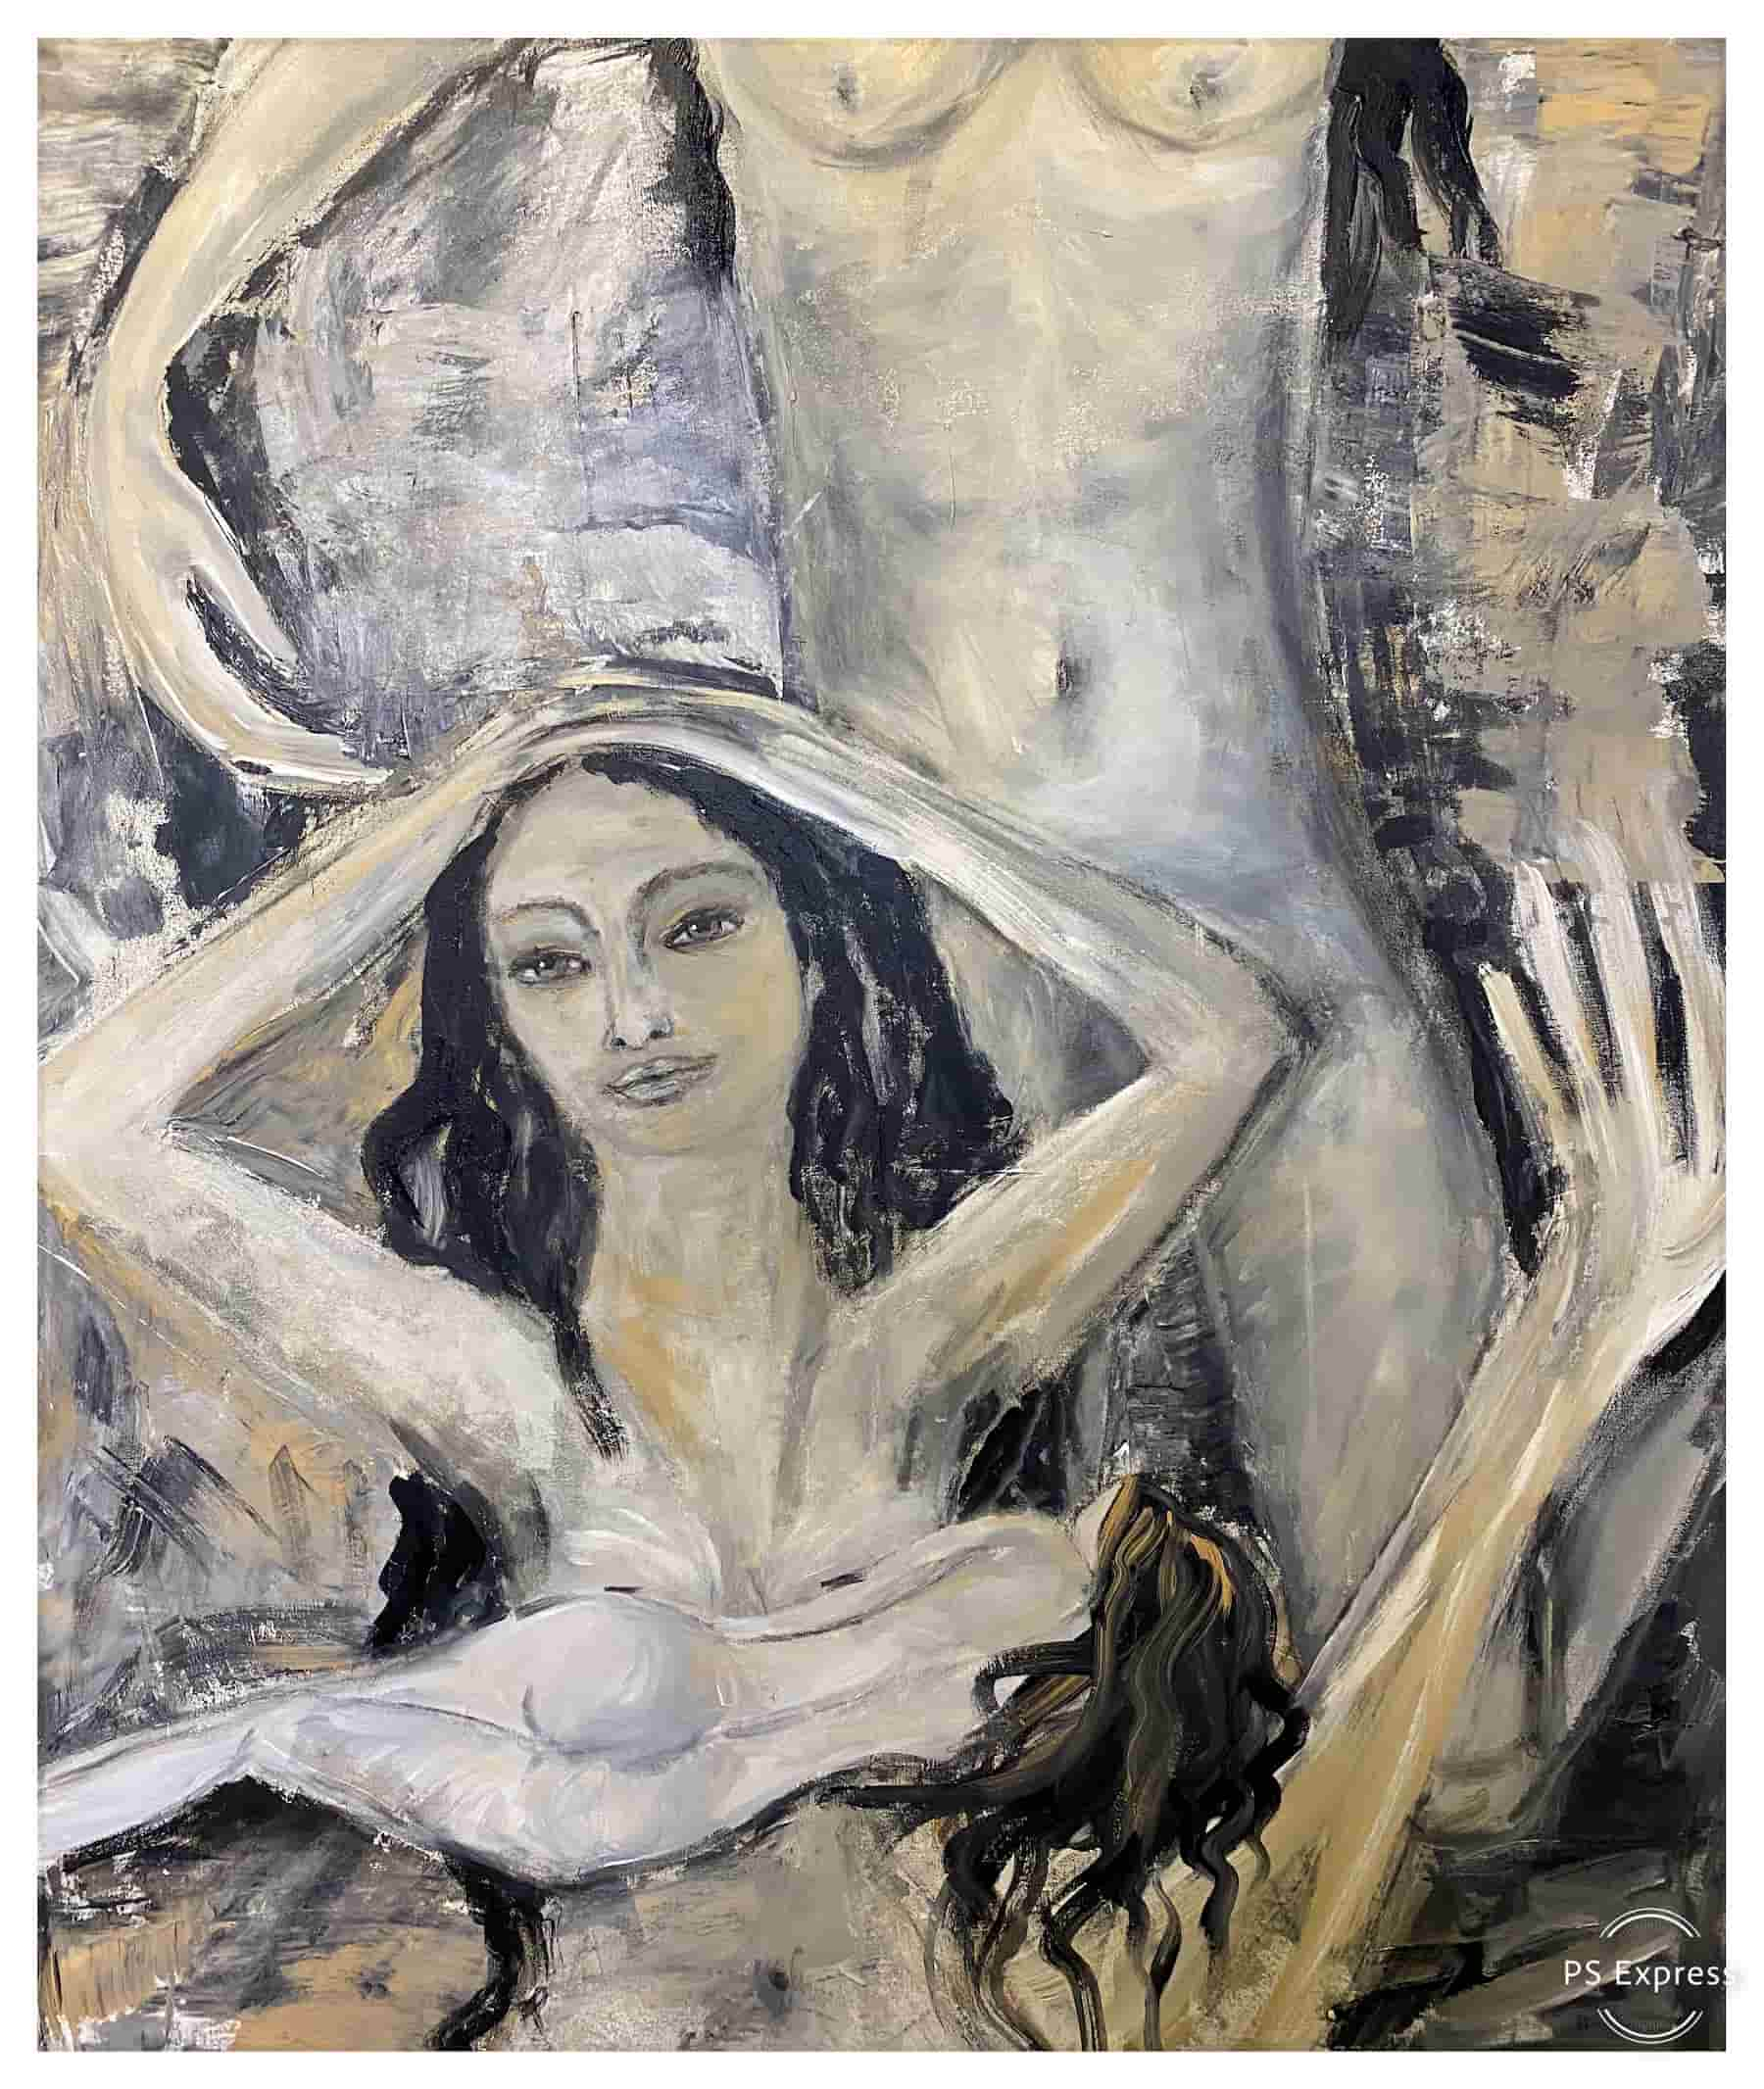 Bild Traum (Acryl und Kohle auf Leinwand, 1,01,10m) by Katja Hofmann